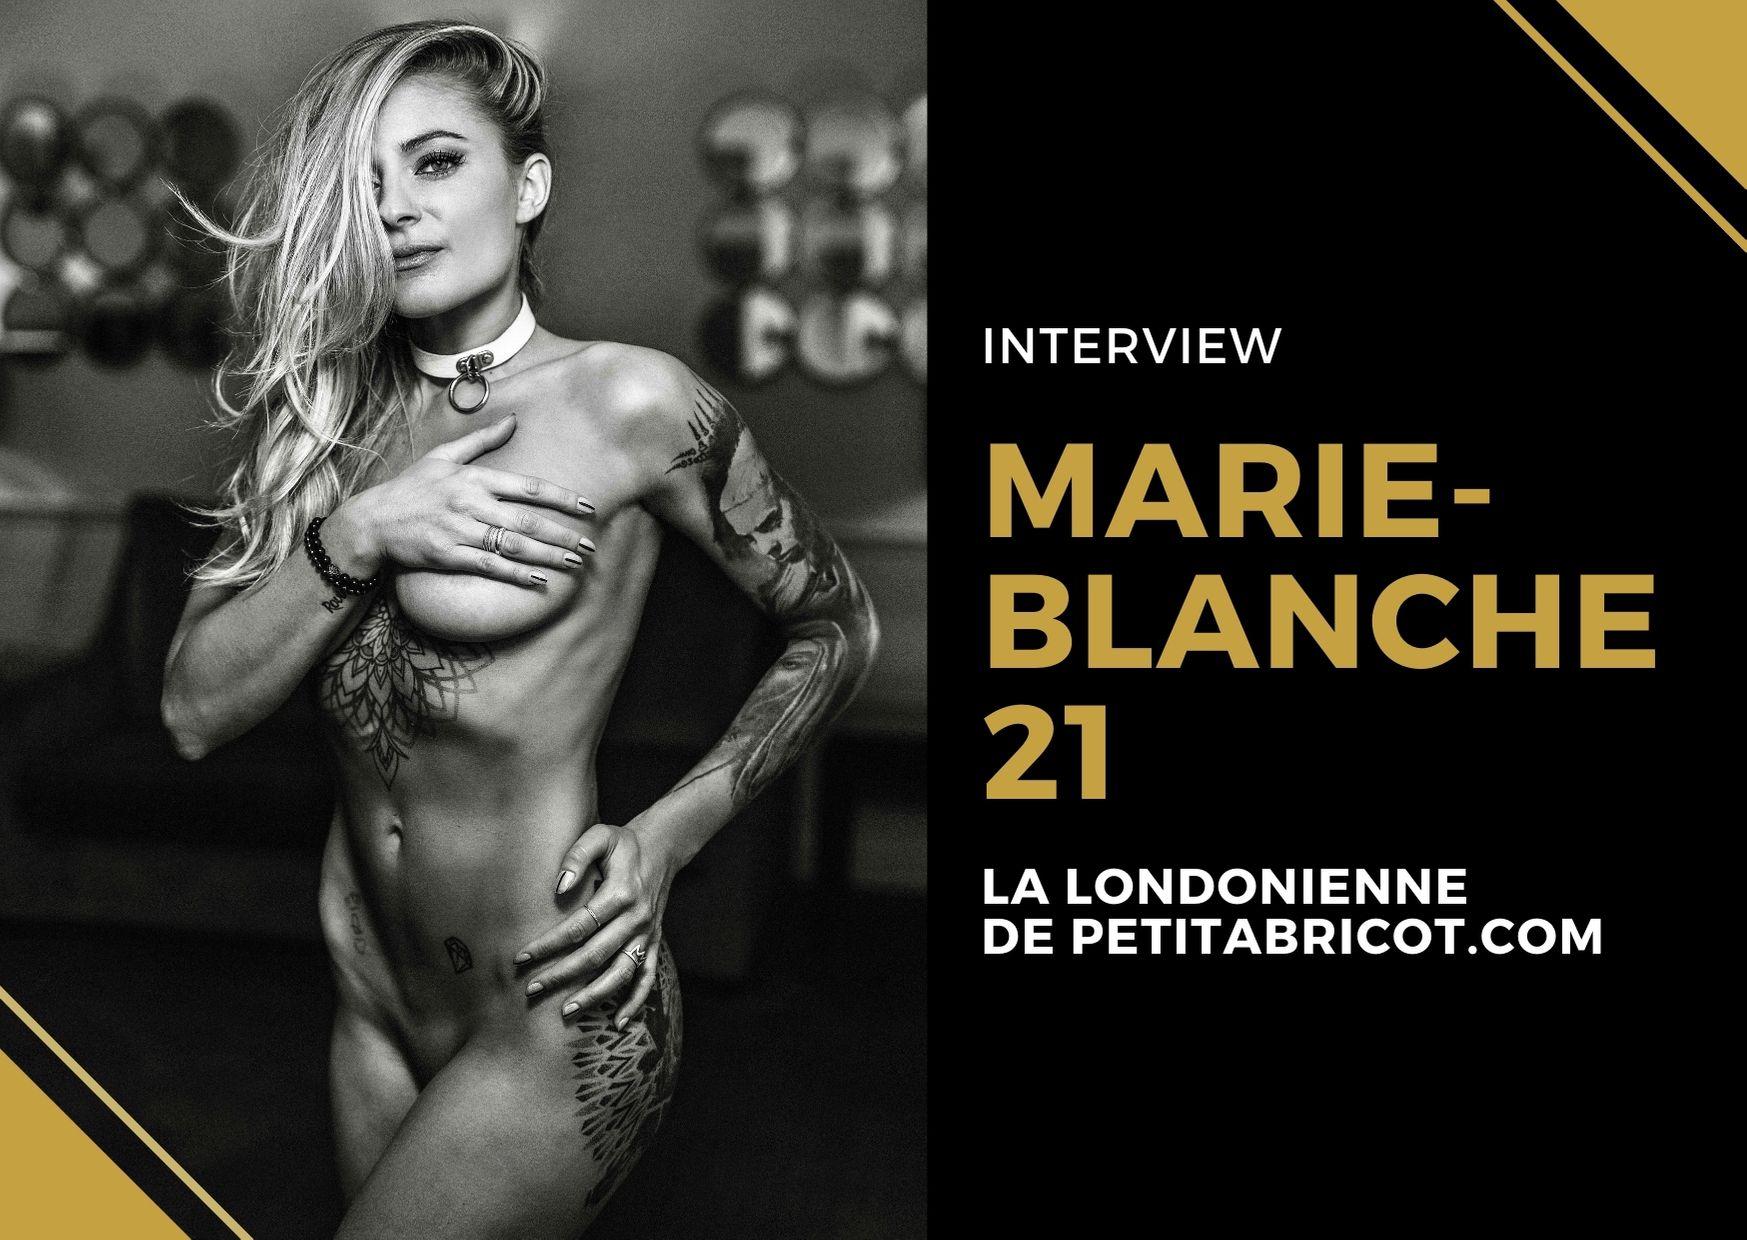 PETITABRICOT_MB21_INTERVIEW_051220_1